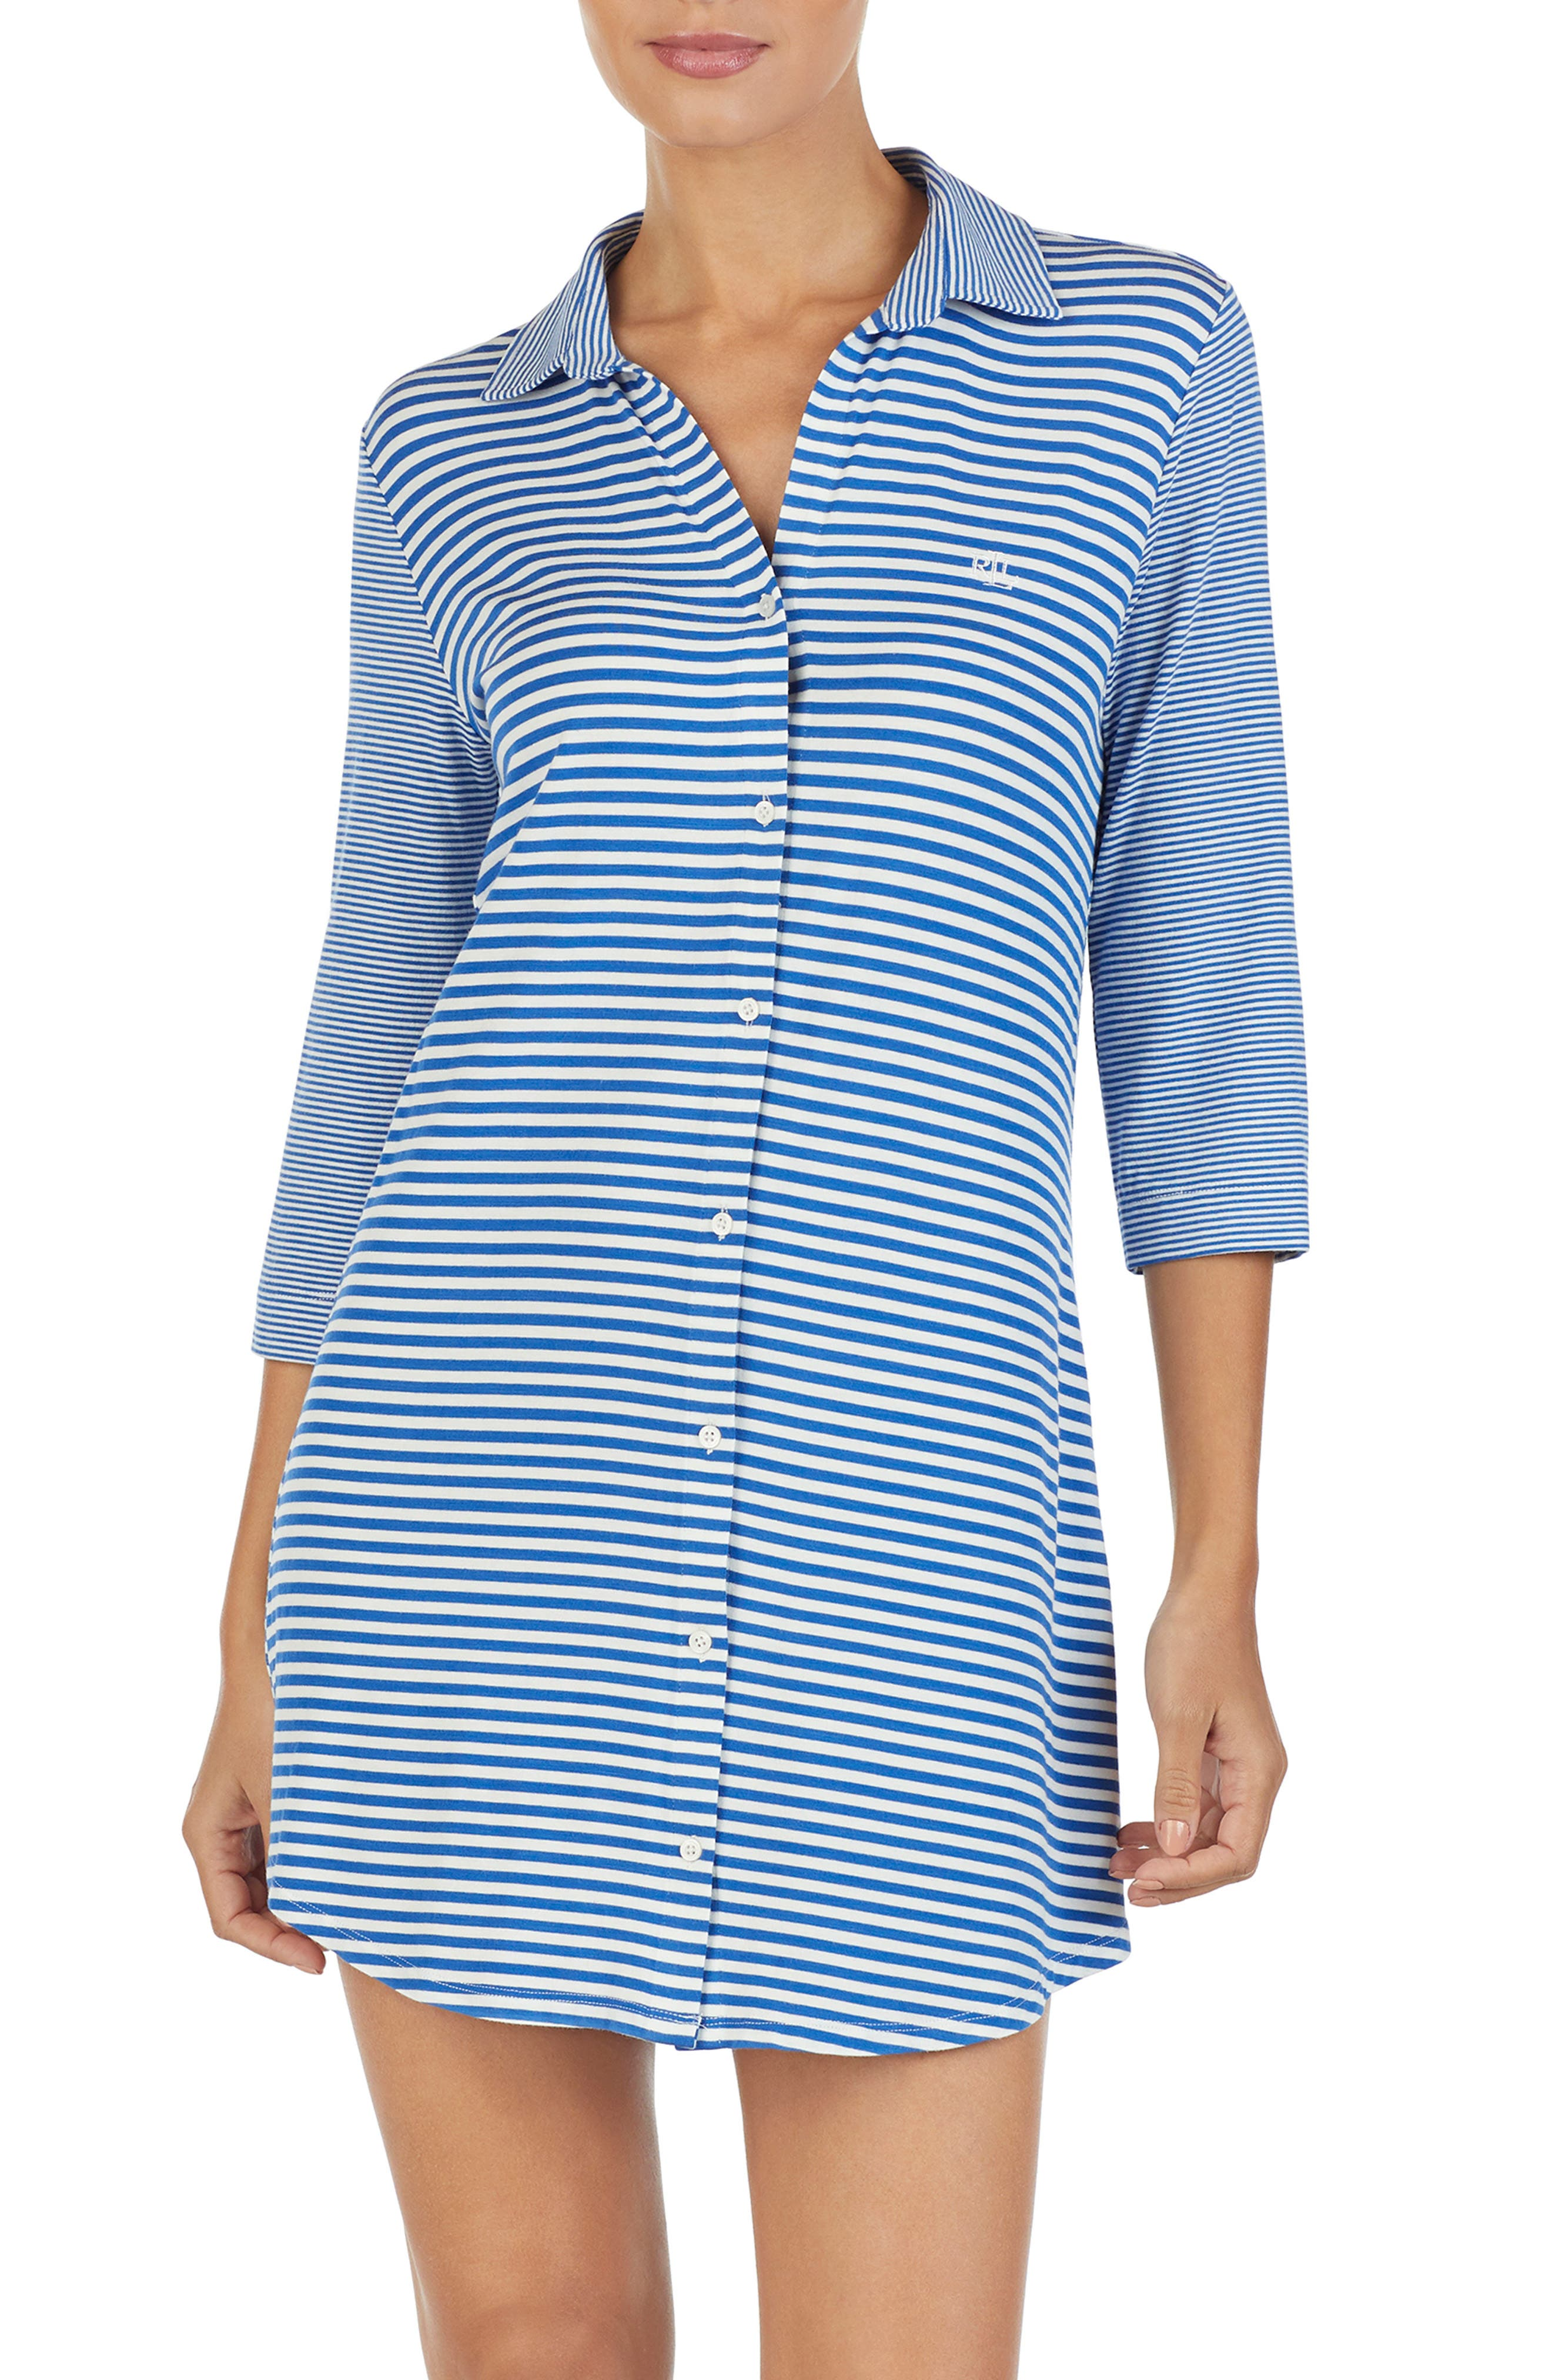 LAUREN RALPH LAUREN, Stripe Sleep Shirt, Main thumbnail 1, color, BLUE STRIPE